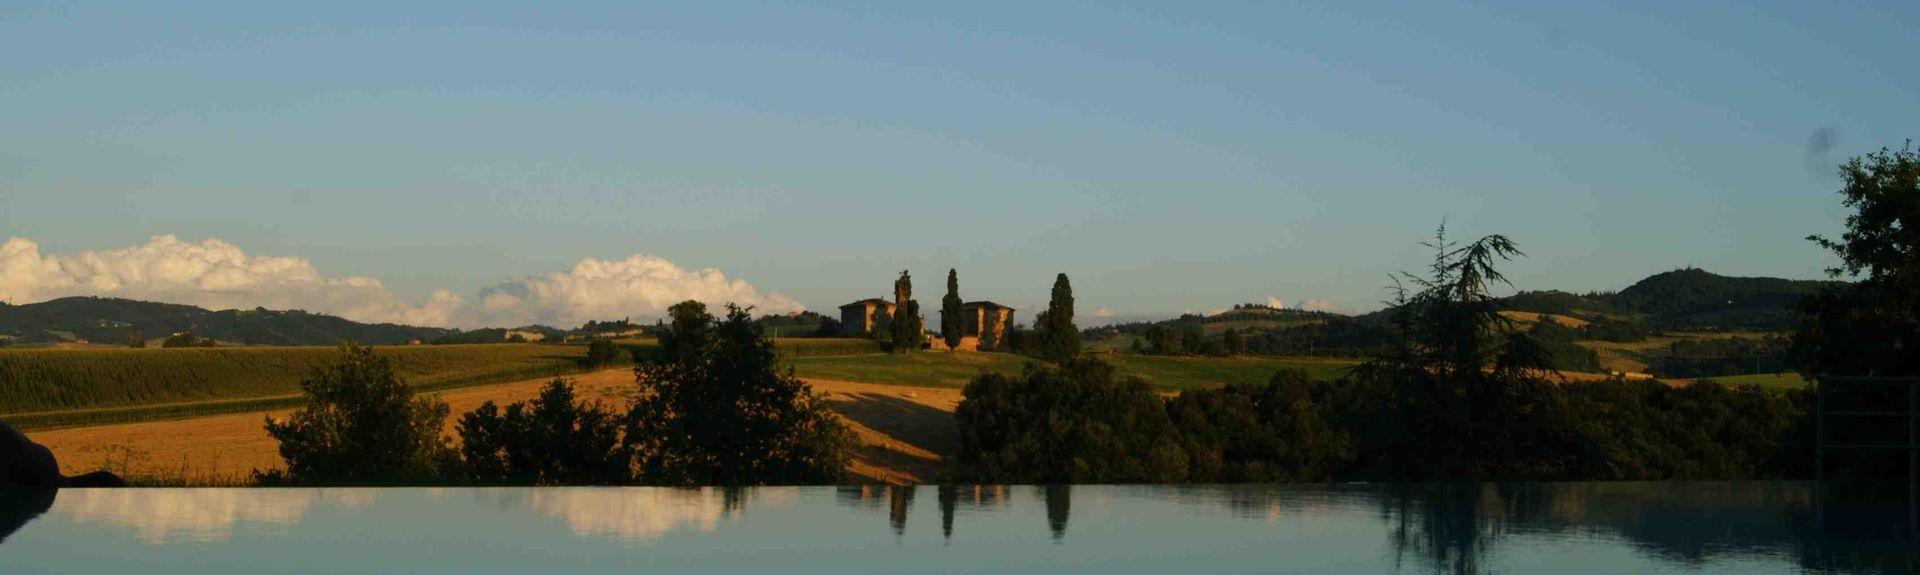 Modena, Emilia-Romagna, Italien